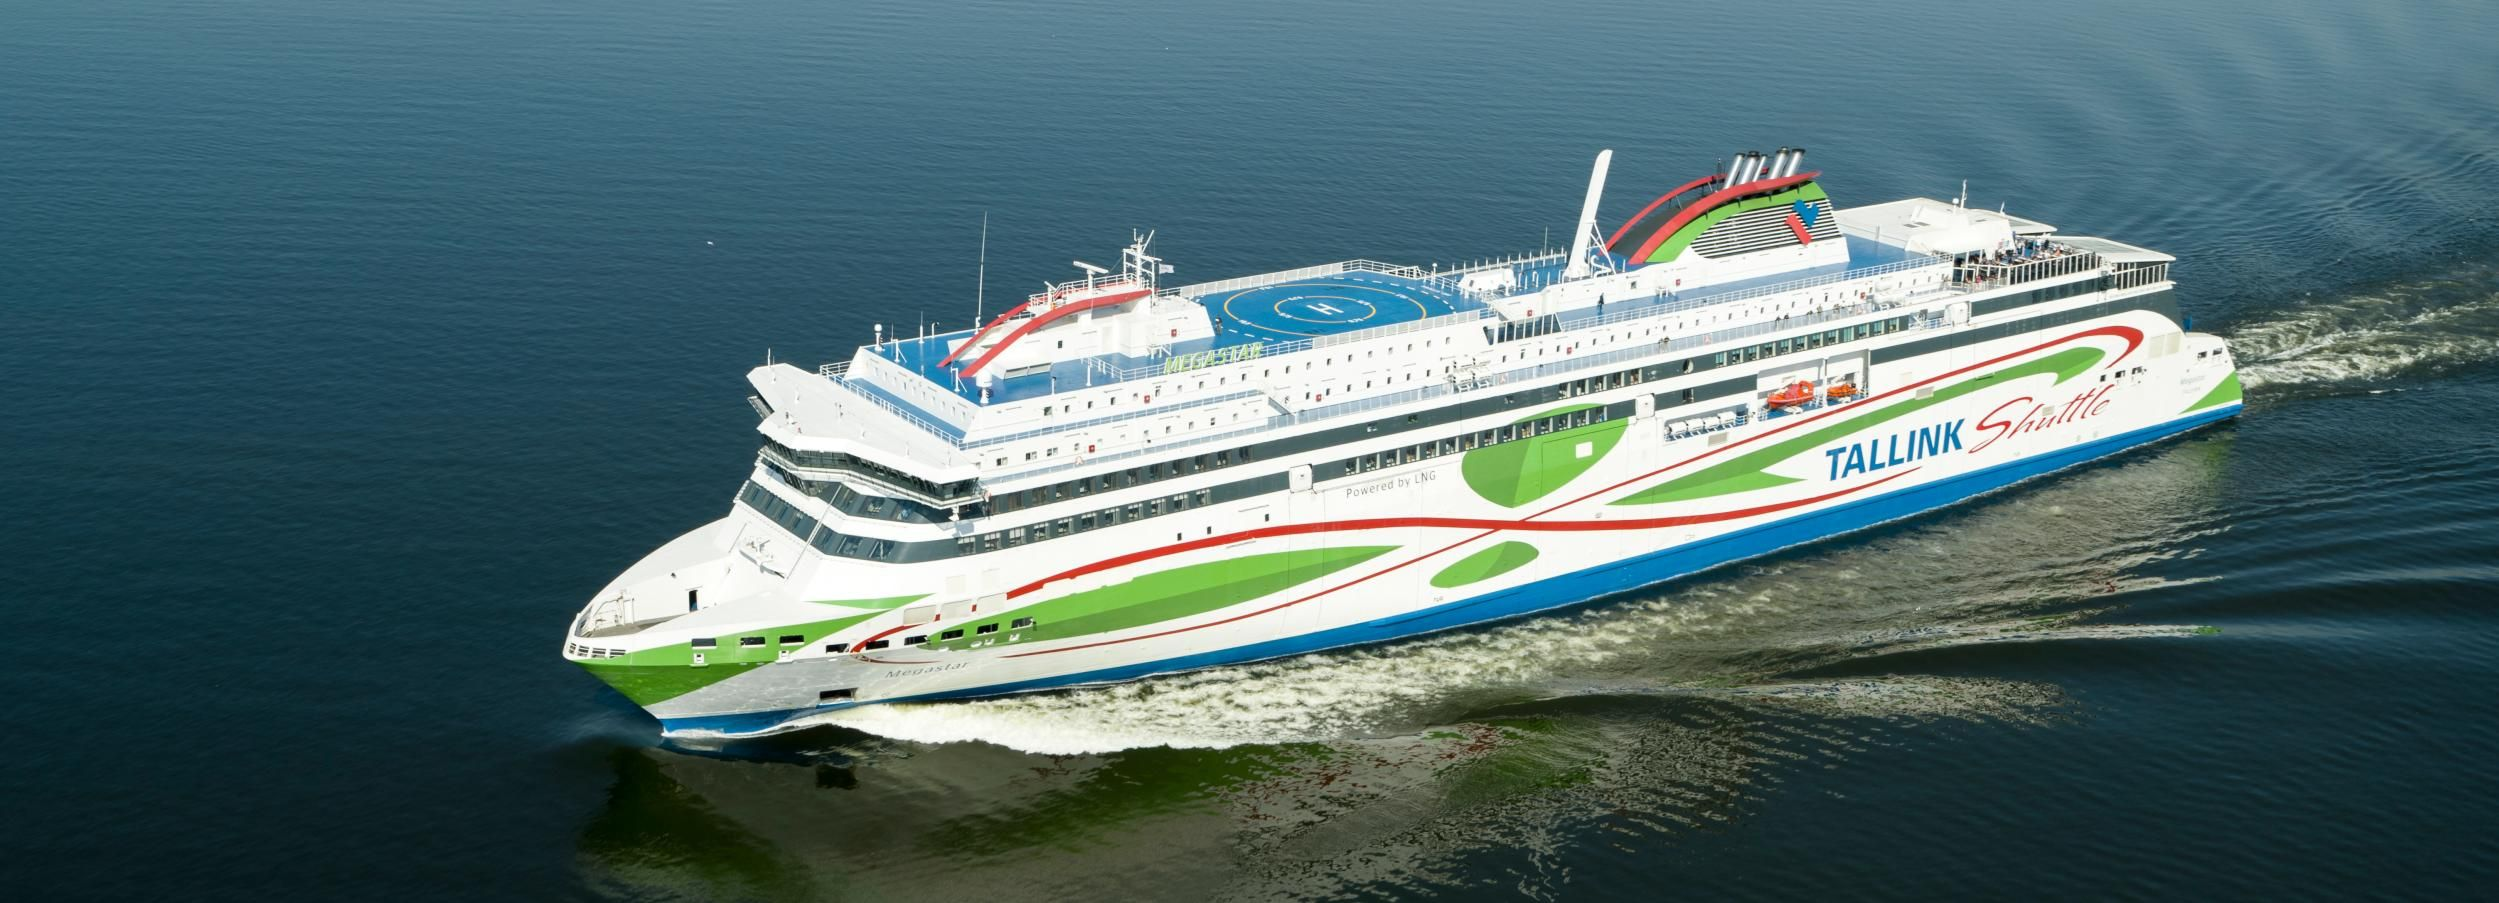 From Tallinn: Return Day Trip Ferry Ticket to Helsinki